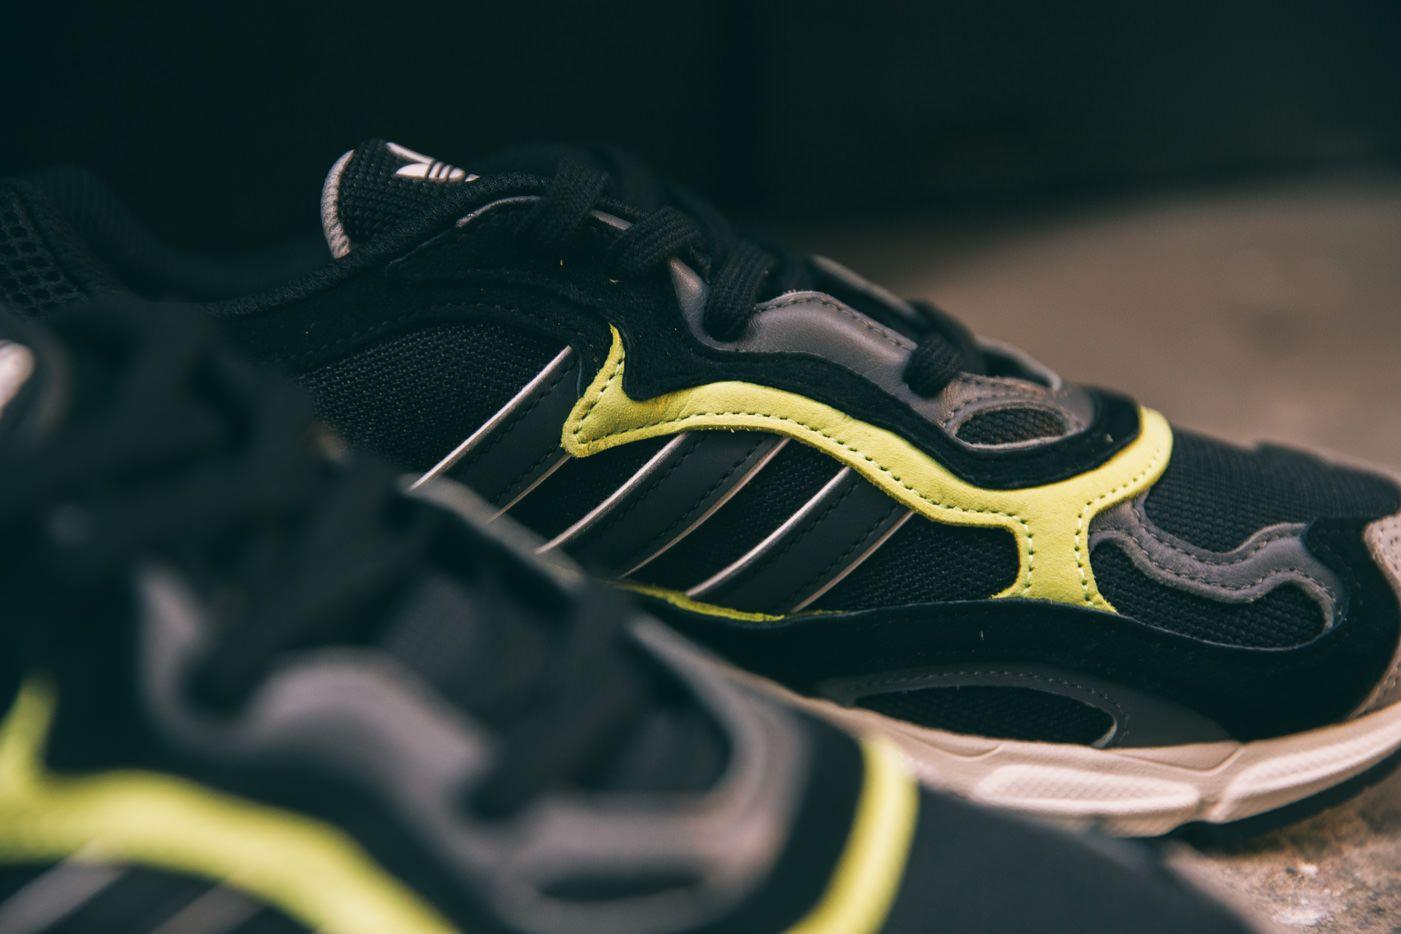 Adidas Originals Temper Run 11 Up Close